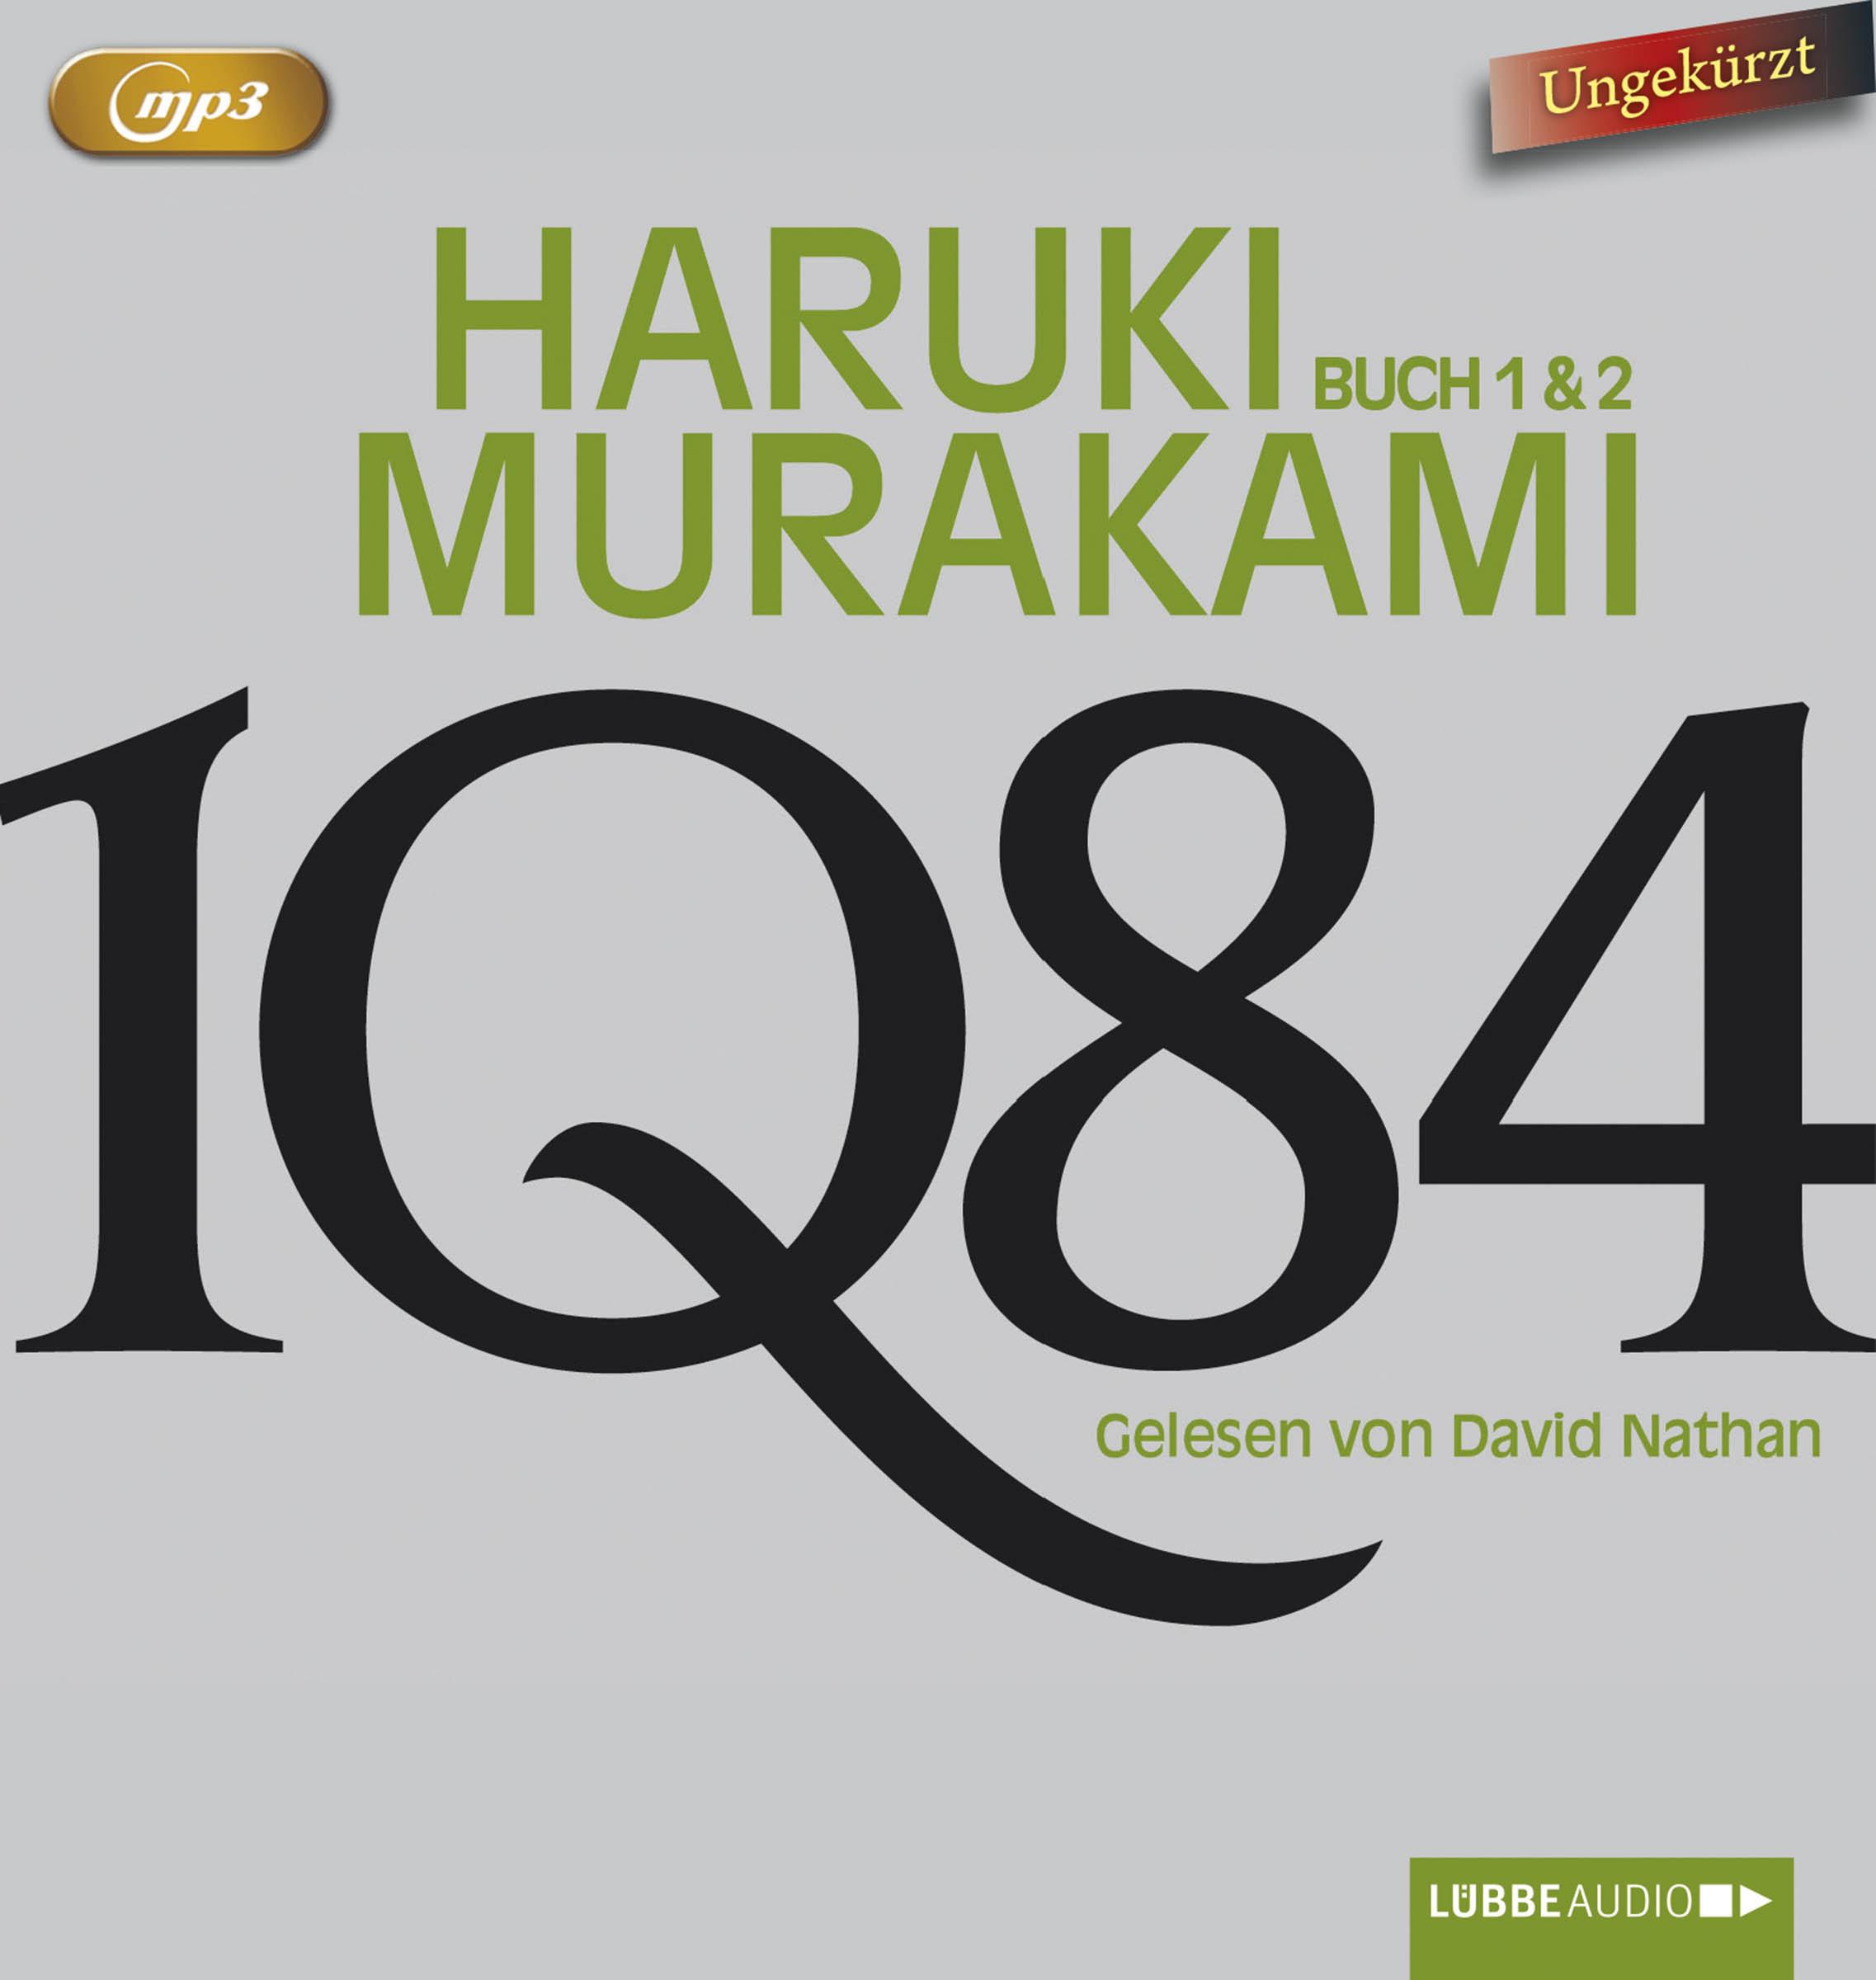 Haruki Murakami - 1Q84 - Buch 1 & 2